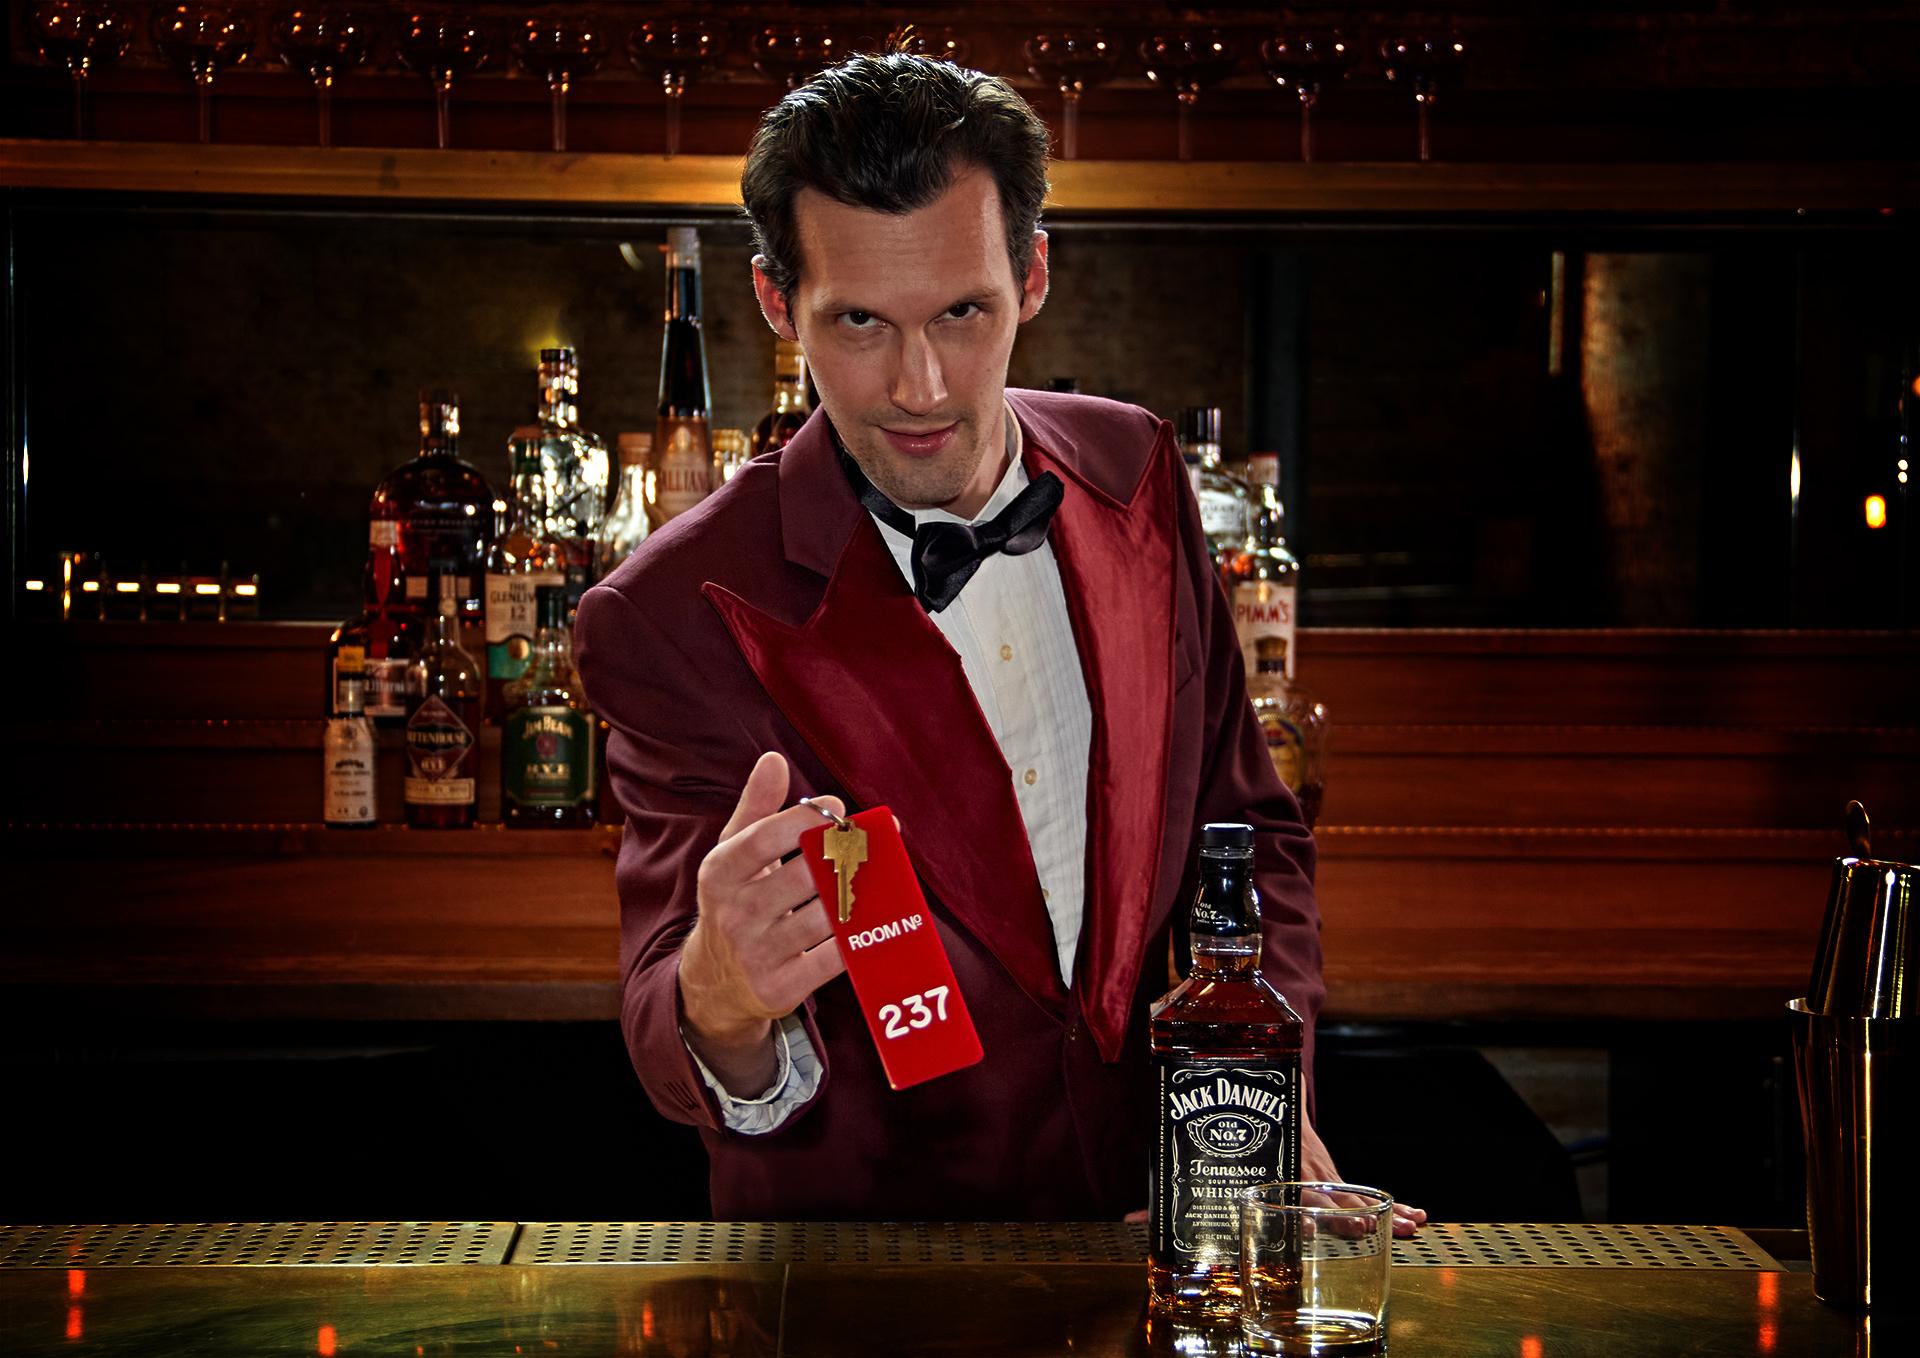 Lloyd the Bartender at Room 237